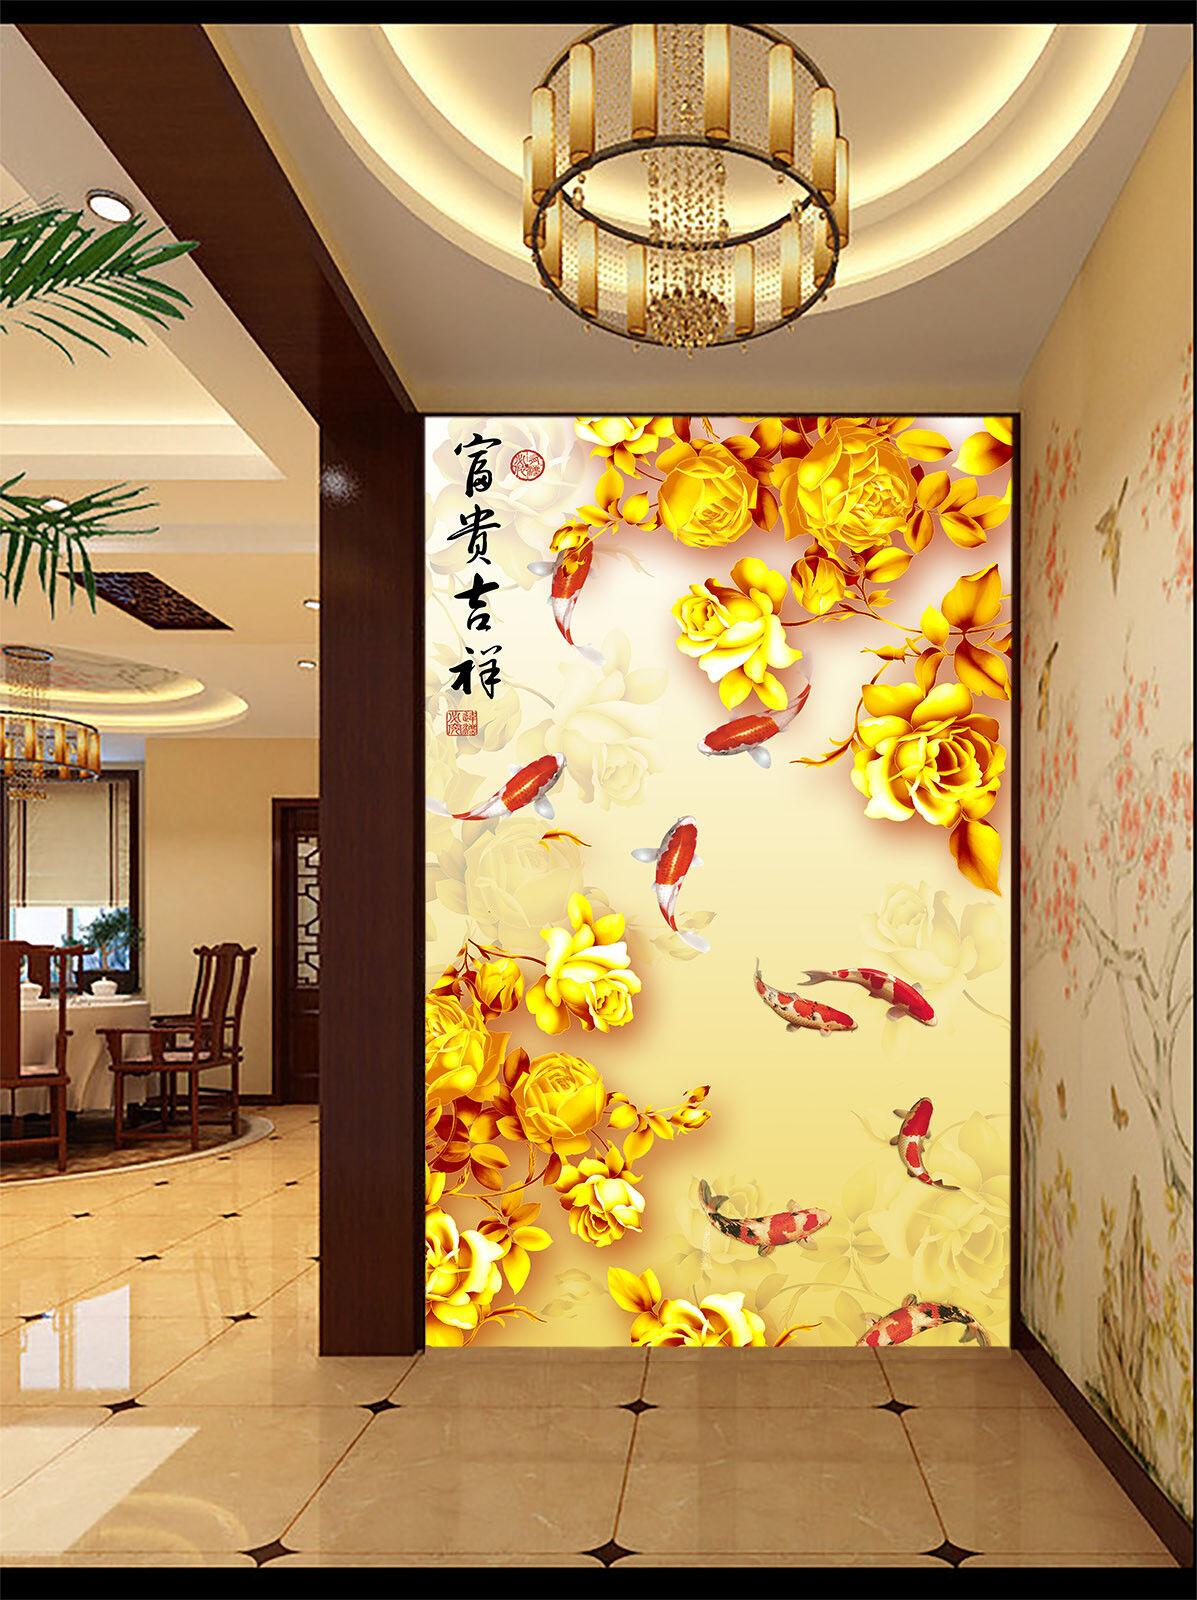 3D Goldene Rosa Roter Roter Roter Koi 77 Tapete Wandgemälde Tapete Tapeten Bild Familie DE | Genial  | Stilvoll und lustig  | Ausgezeichnet (in) Qualität  8794b6